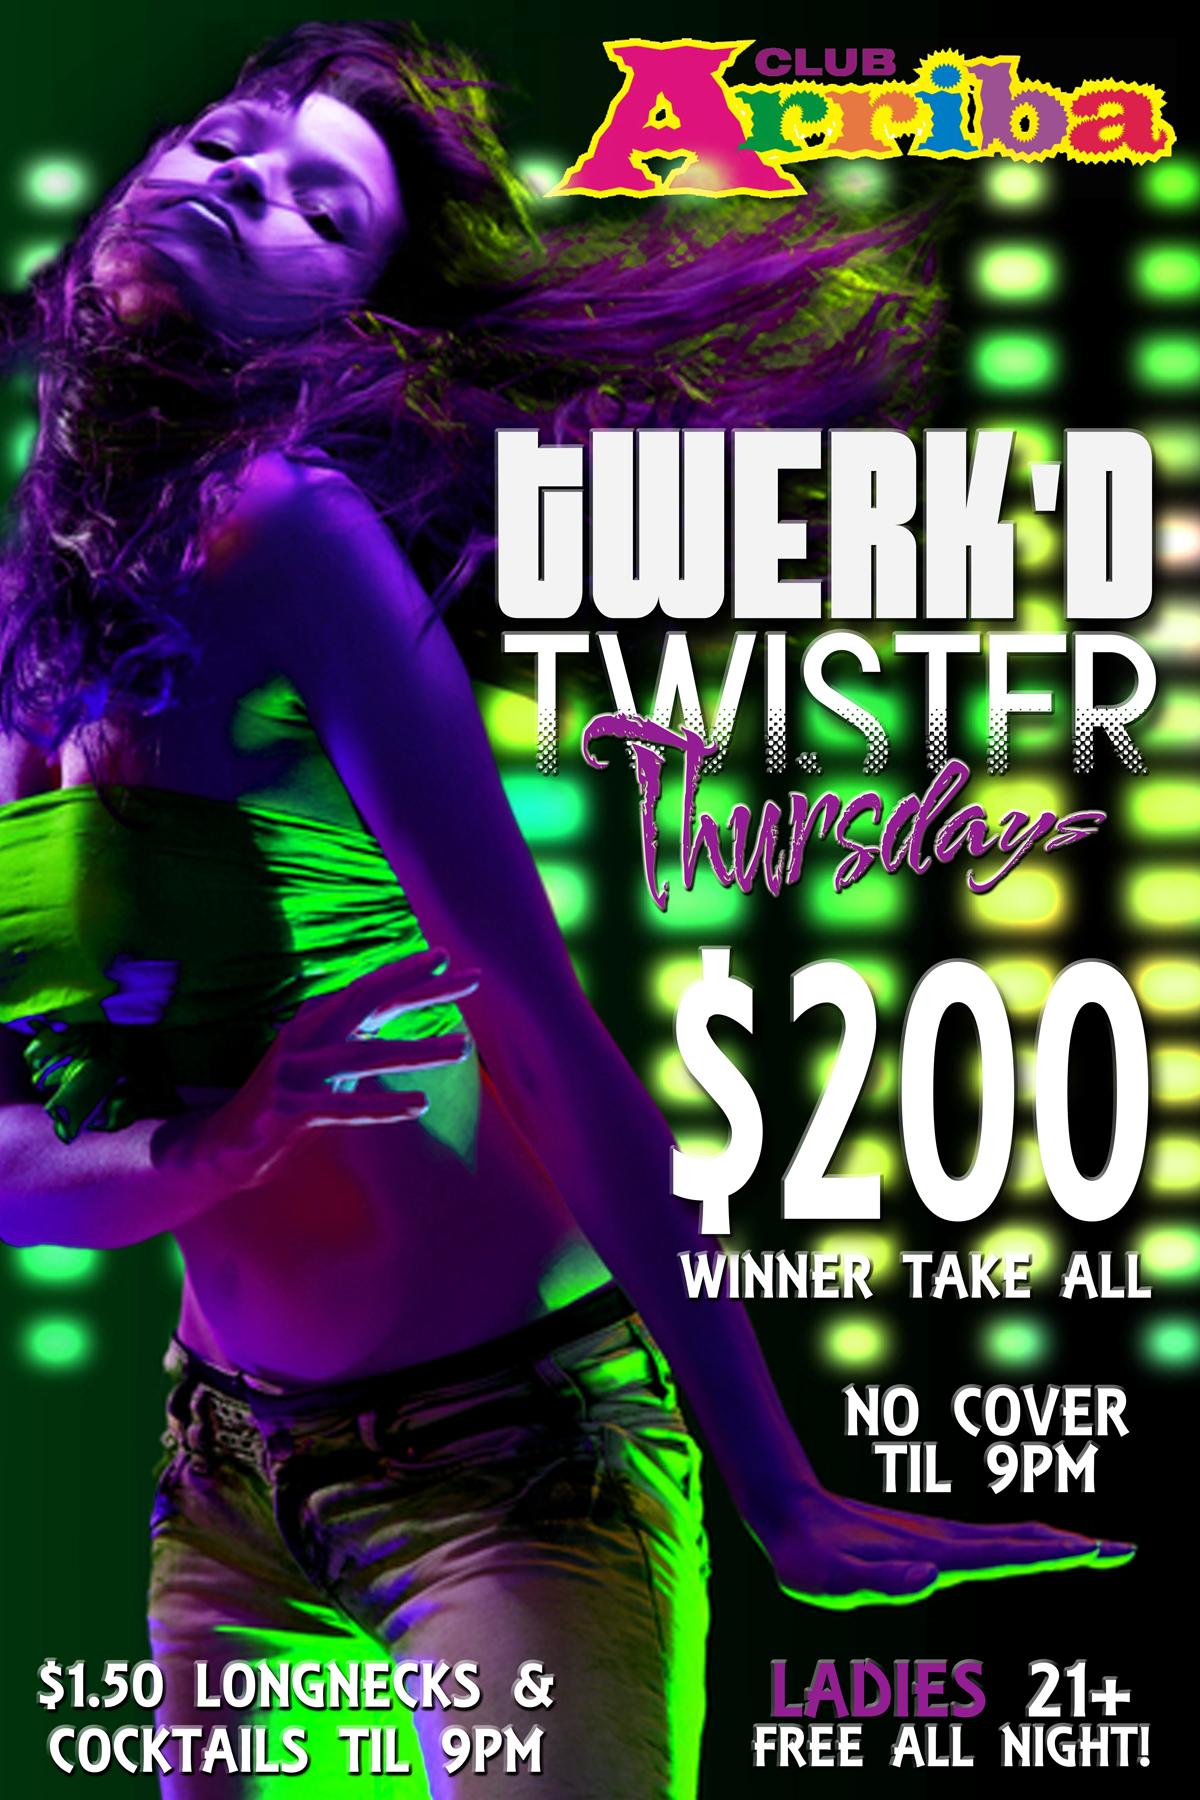 Zumba poster design - Twerk D Twister Contest Flyer Design For Club Arriba Nightclub In Midland